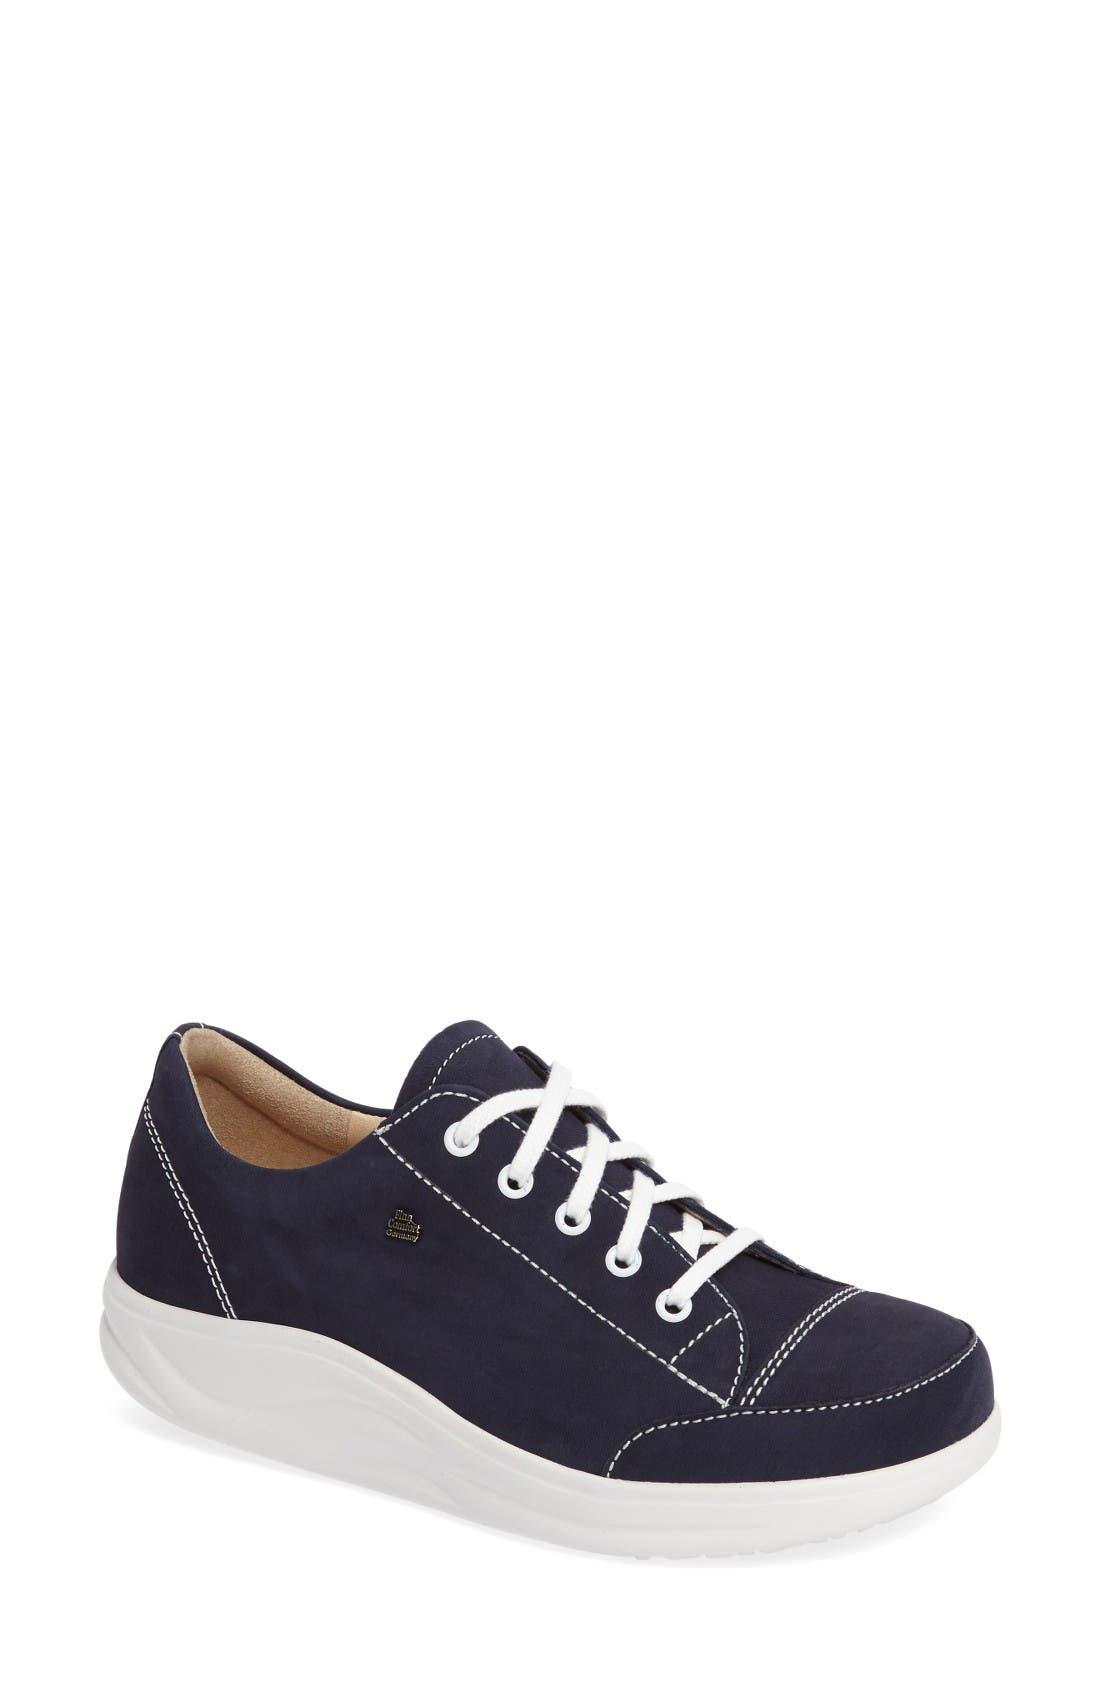 FINNAMIC by Finn Comfort 'Ikebukuro' Walking Shoe,                         Main,                         color, Atlantic Leather